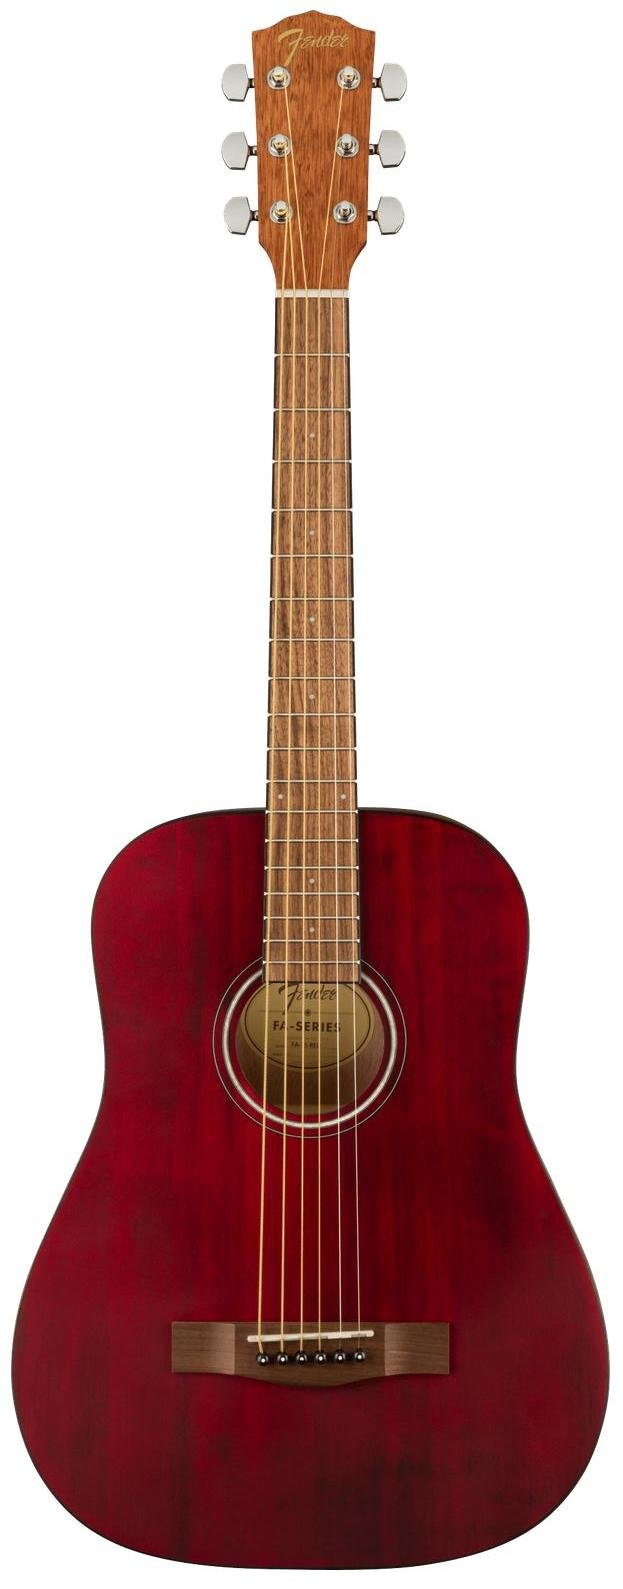 Fender FA-15 3/4 Scale Steel with Gig Bag, Walnut Fingerboard - Red